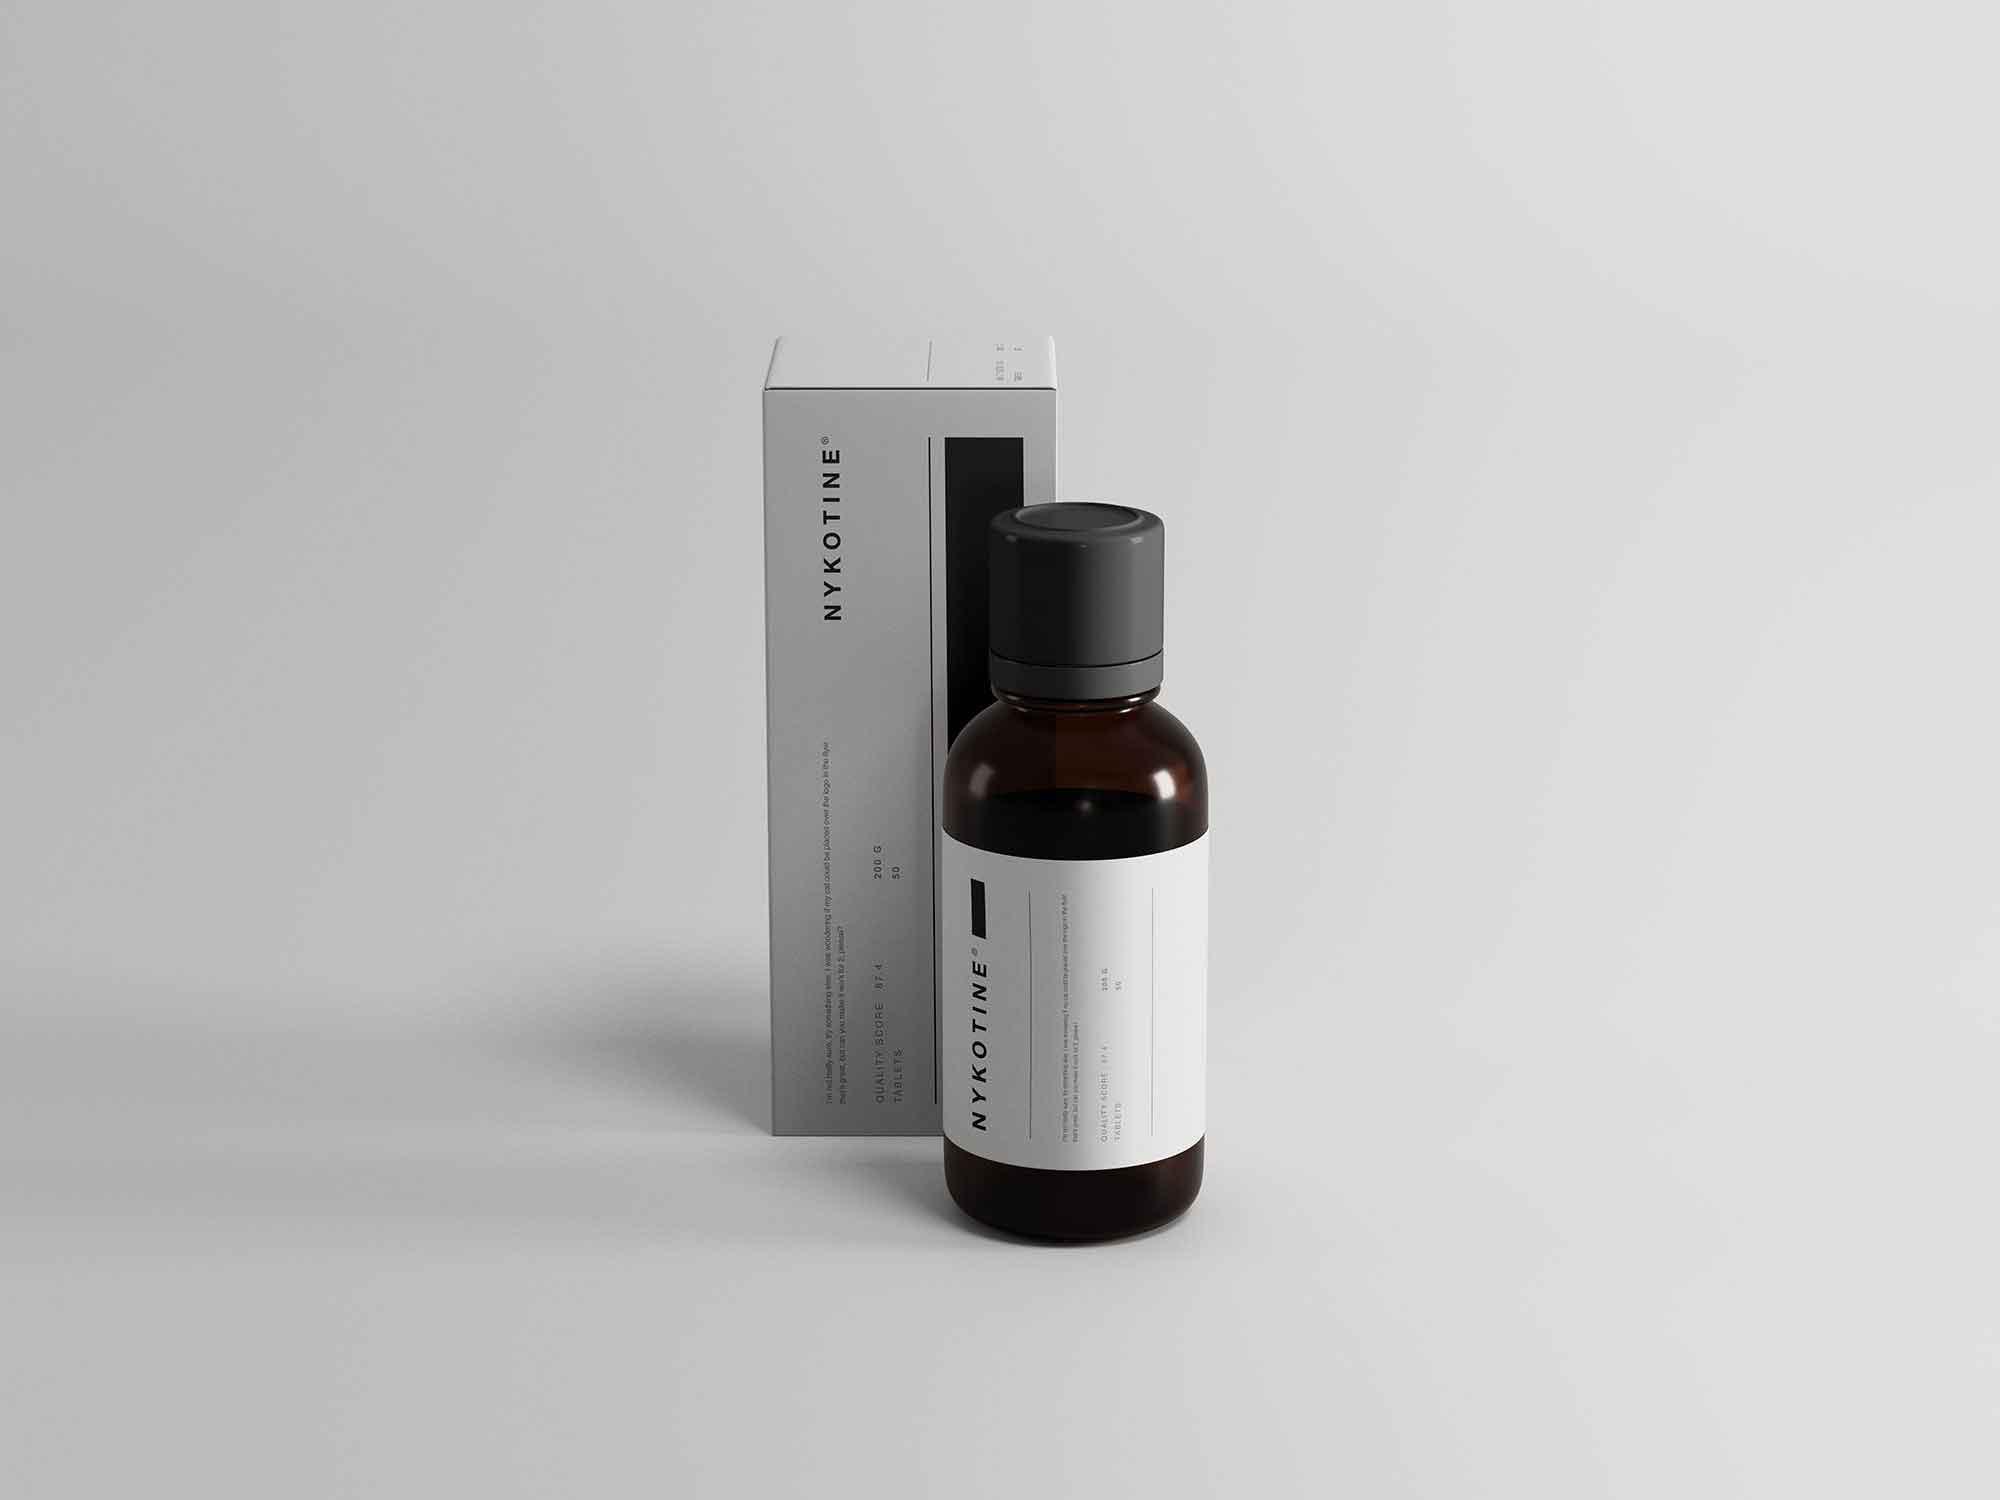 Medicine Bottle and Box Packaging Mockup